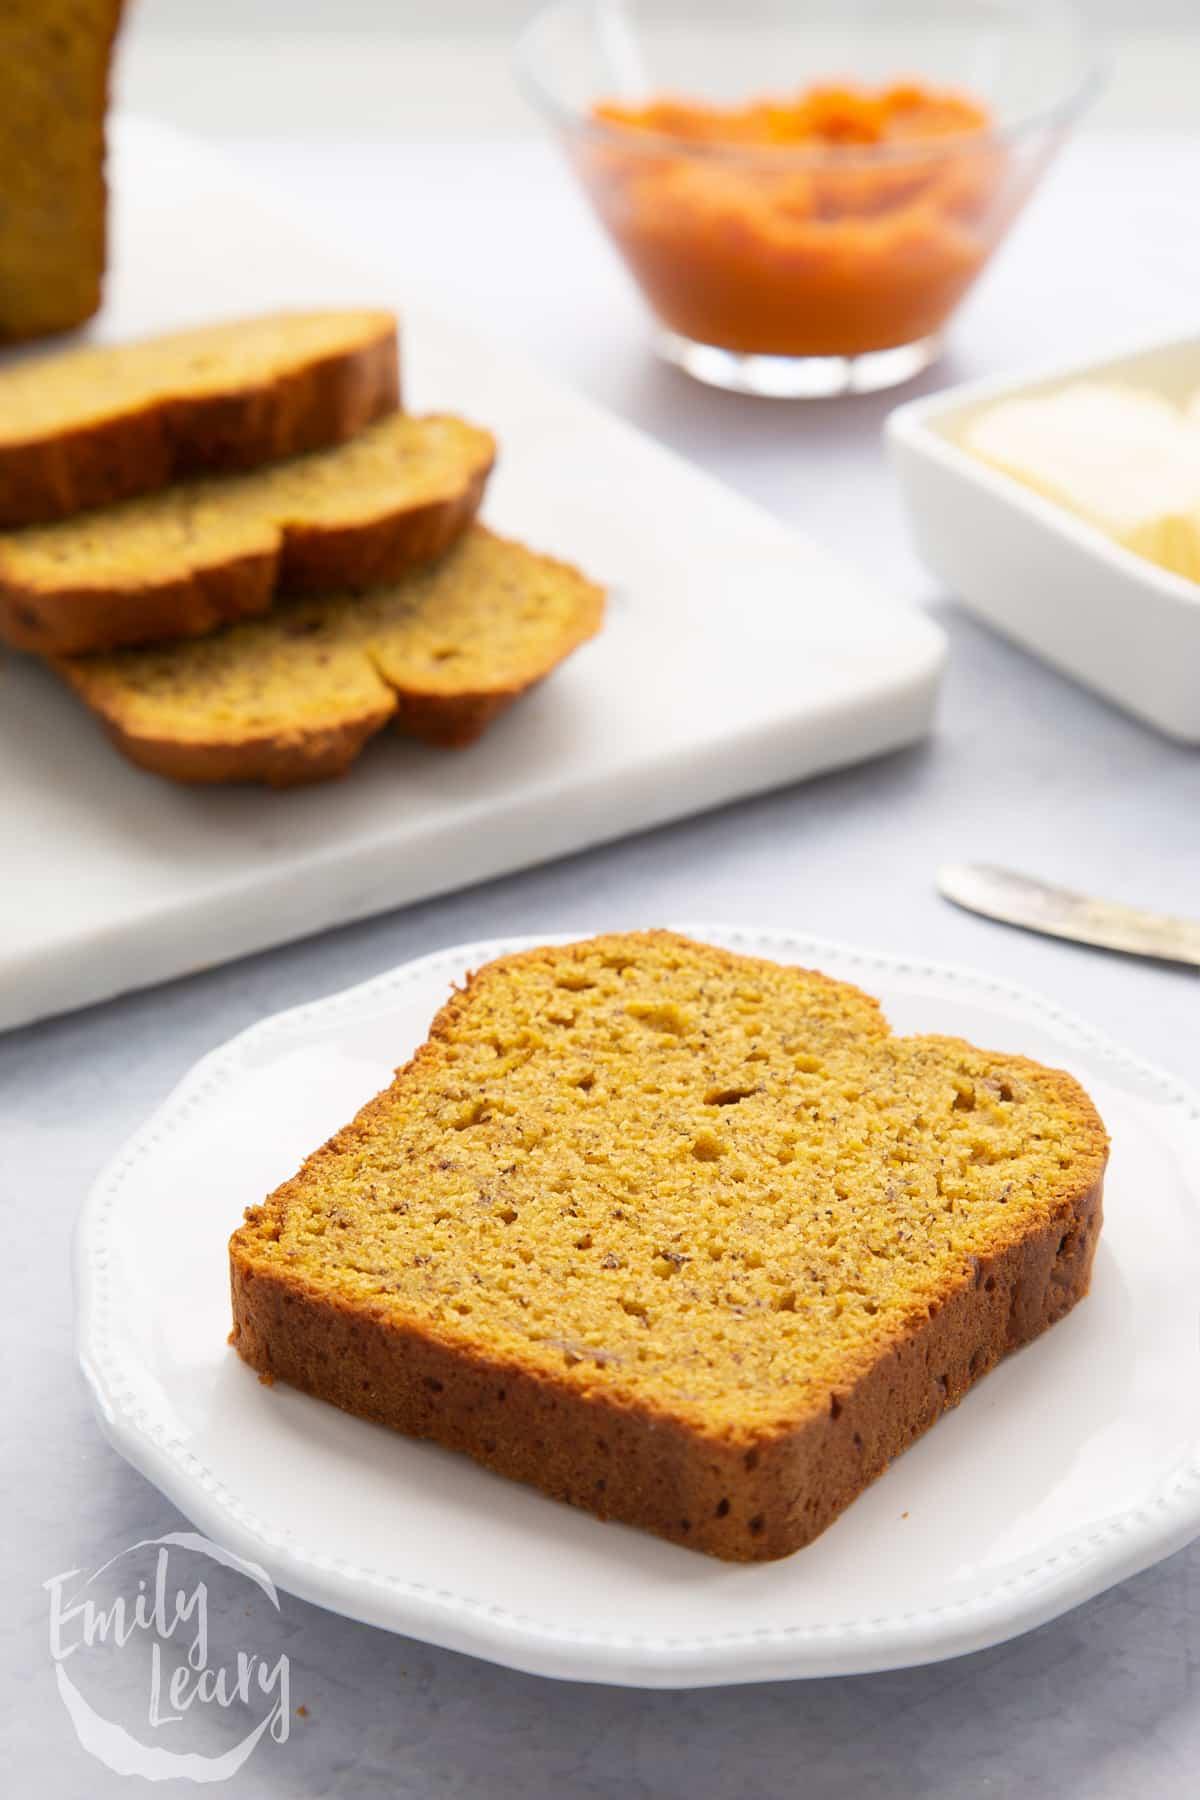 Slice of pumpkin banana bread on a white plate.